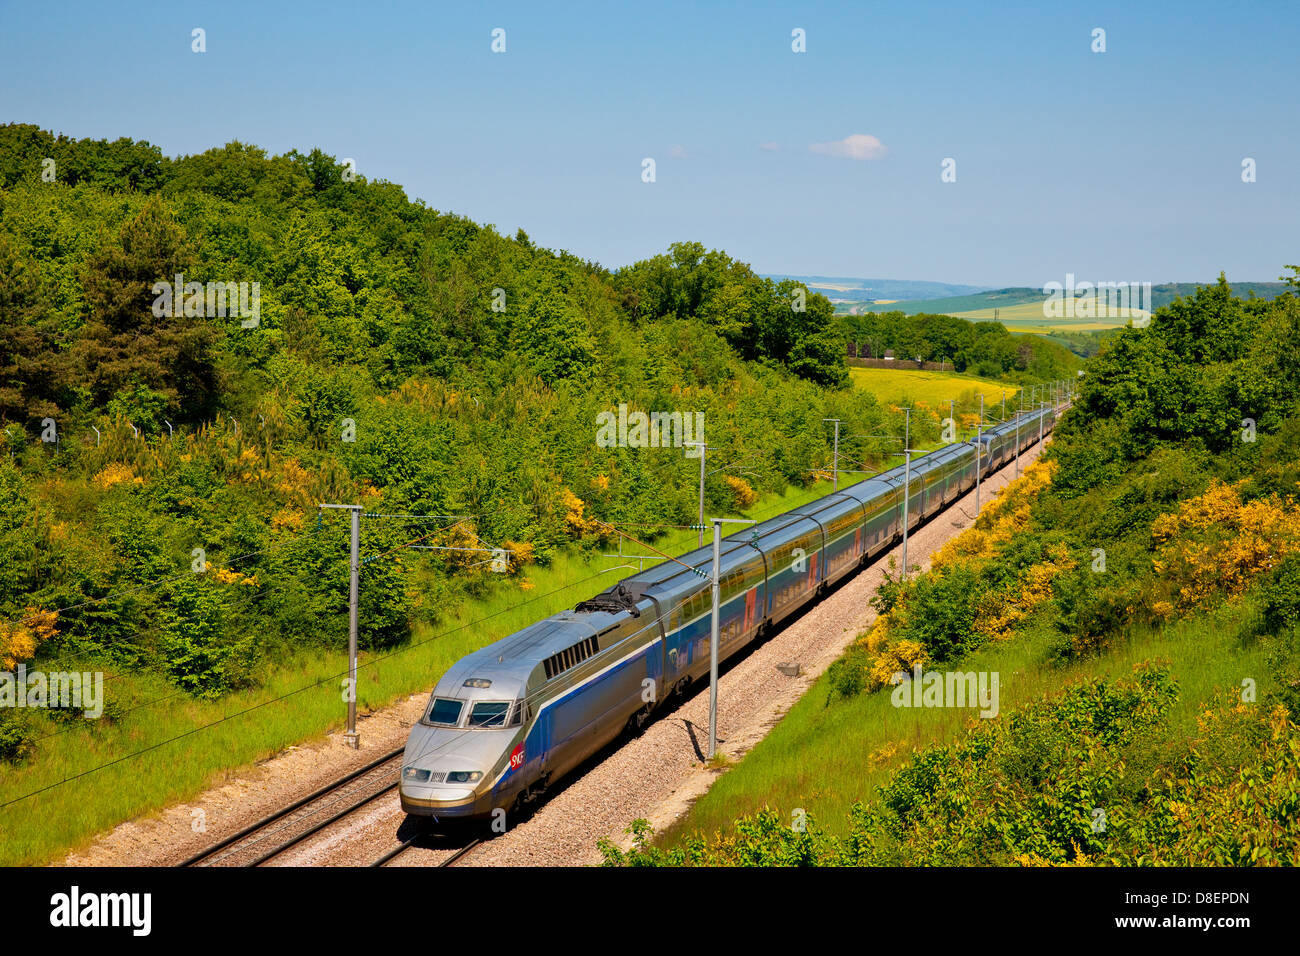 TGV Duplex ( French high-speed rail service ) in the LGV Sud-Est near Sens, France - Stock Image